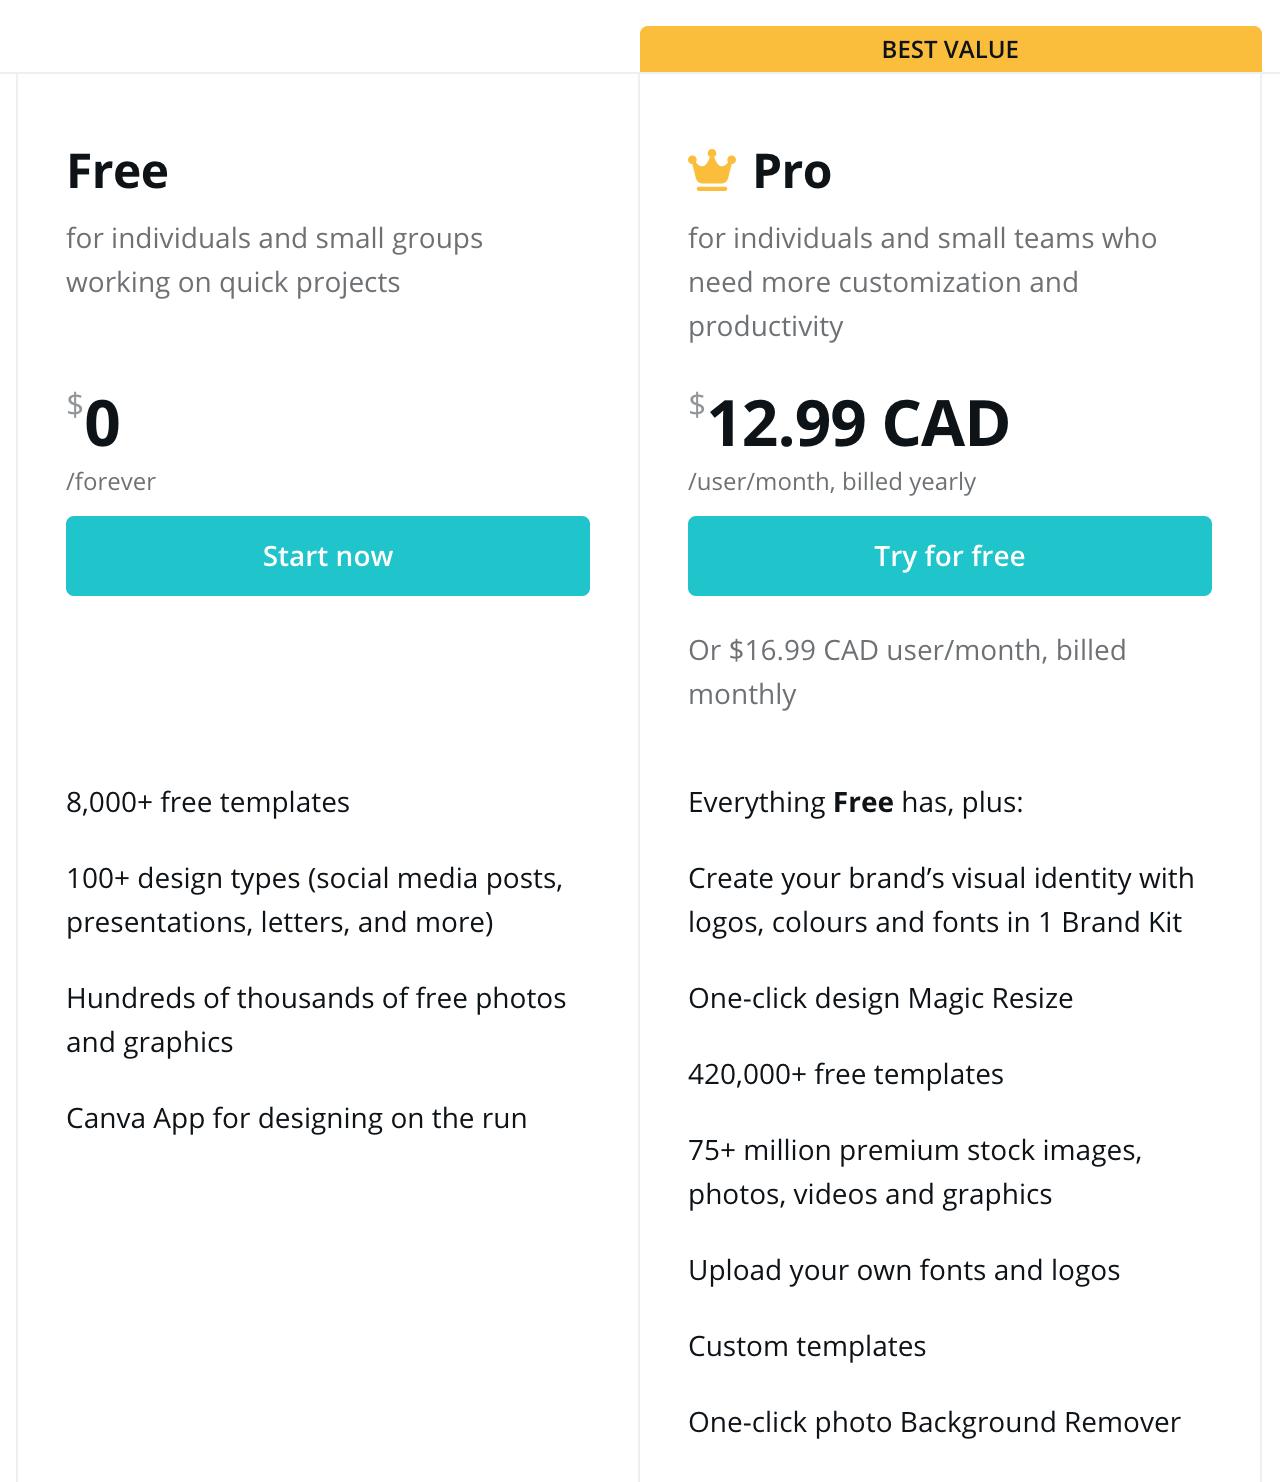 Canva Free vs. Pro Versions